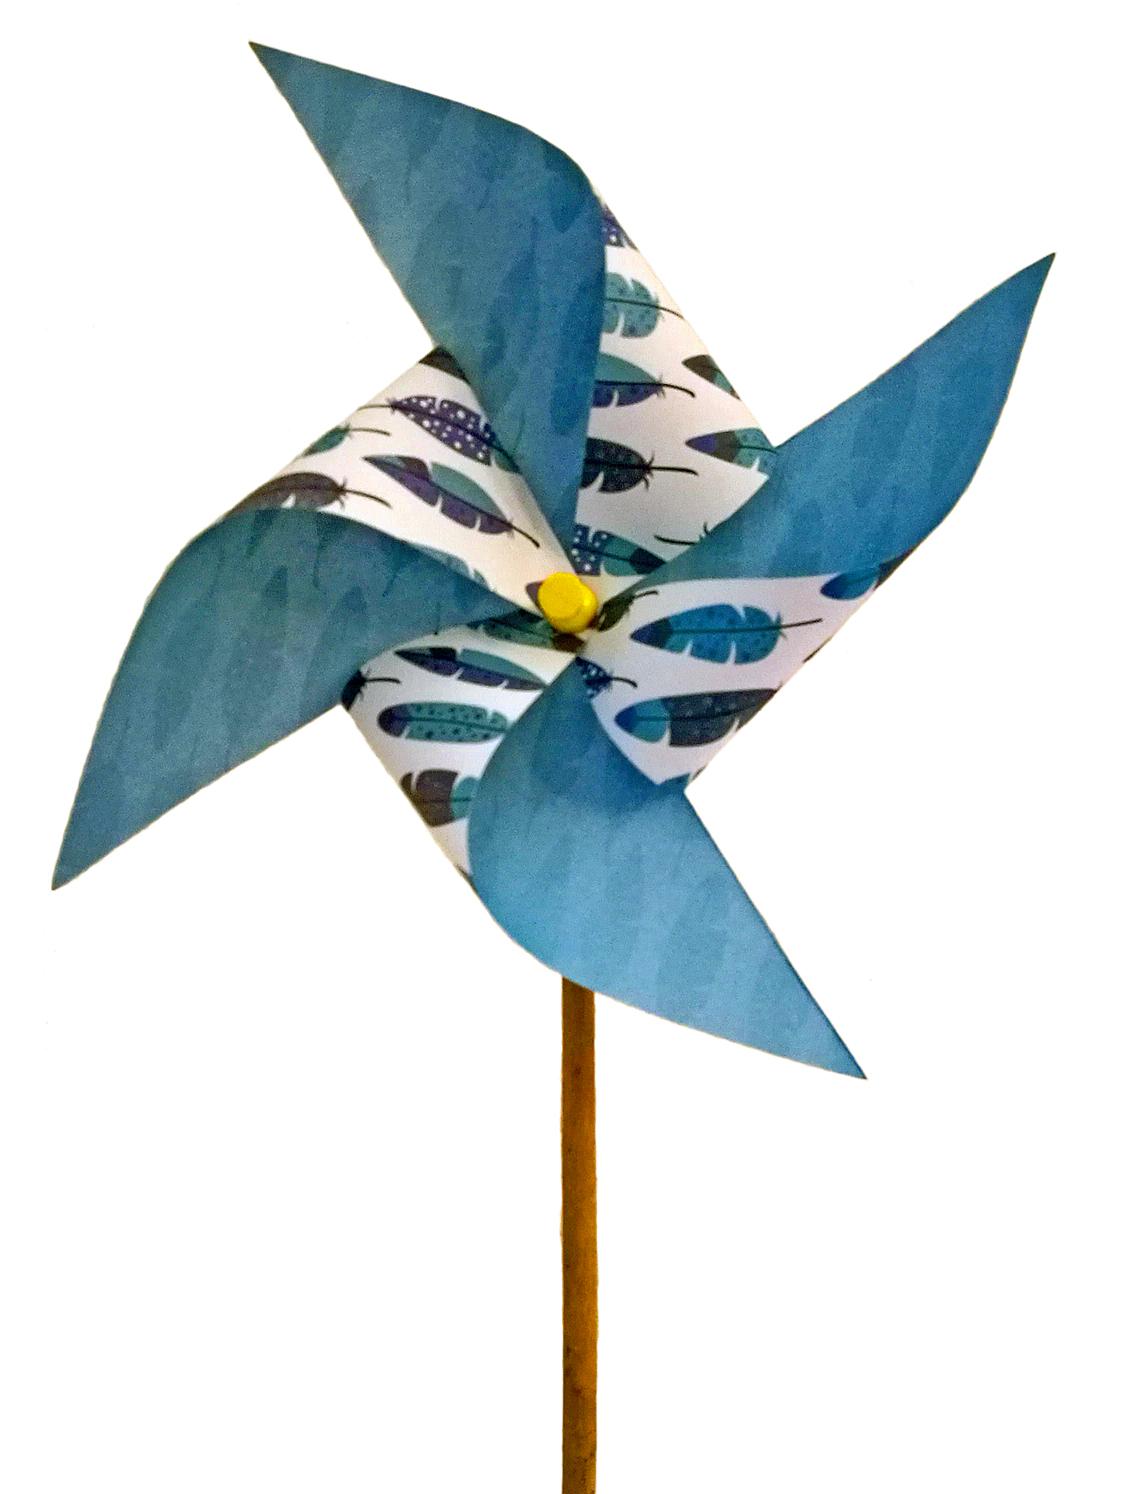 20 Simple origami Ninja Star | Origami easy, Ninja star, Origami | 1494x1122